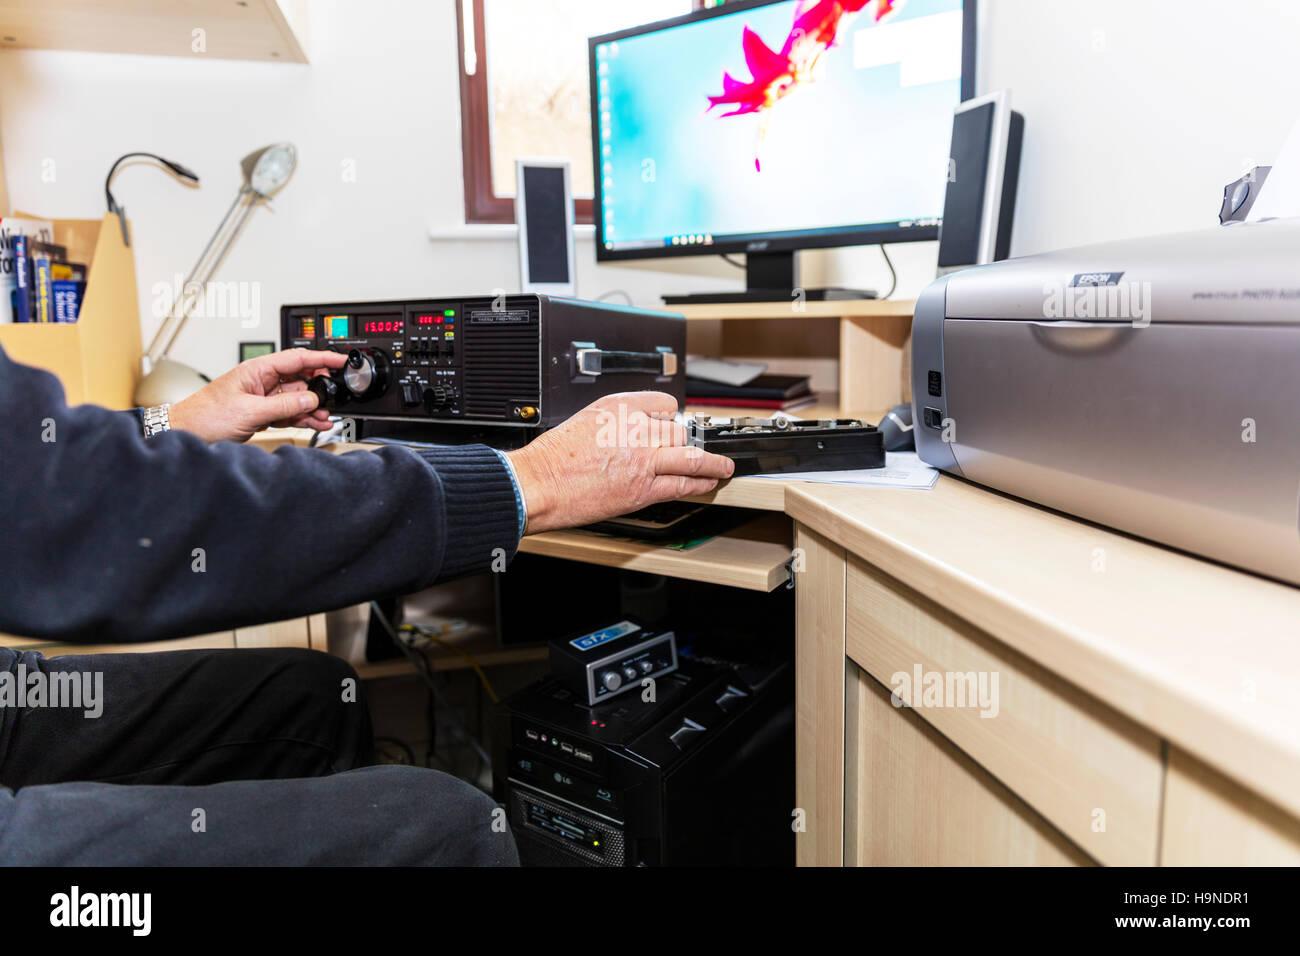 Using Morse key morse code Radio ham amateur radio enthusiast using Yaesu FRG 7000 High Frequency receiver changing - Stock Image